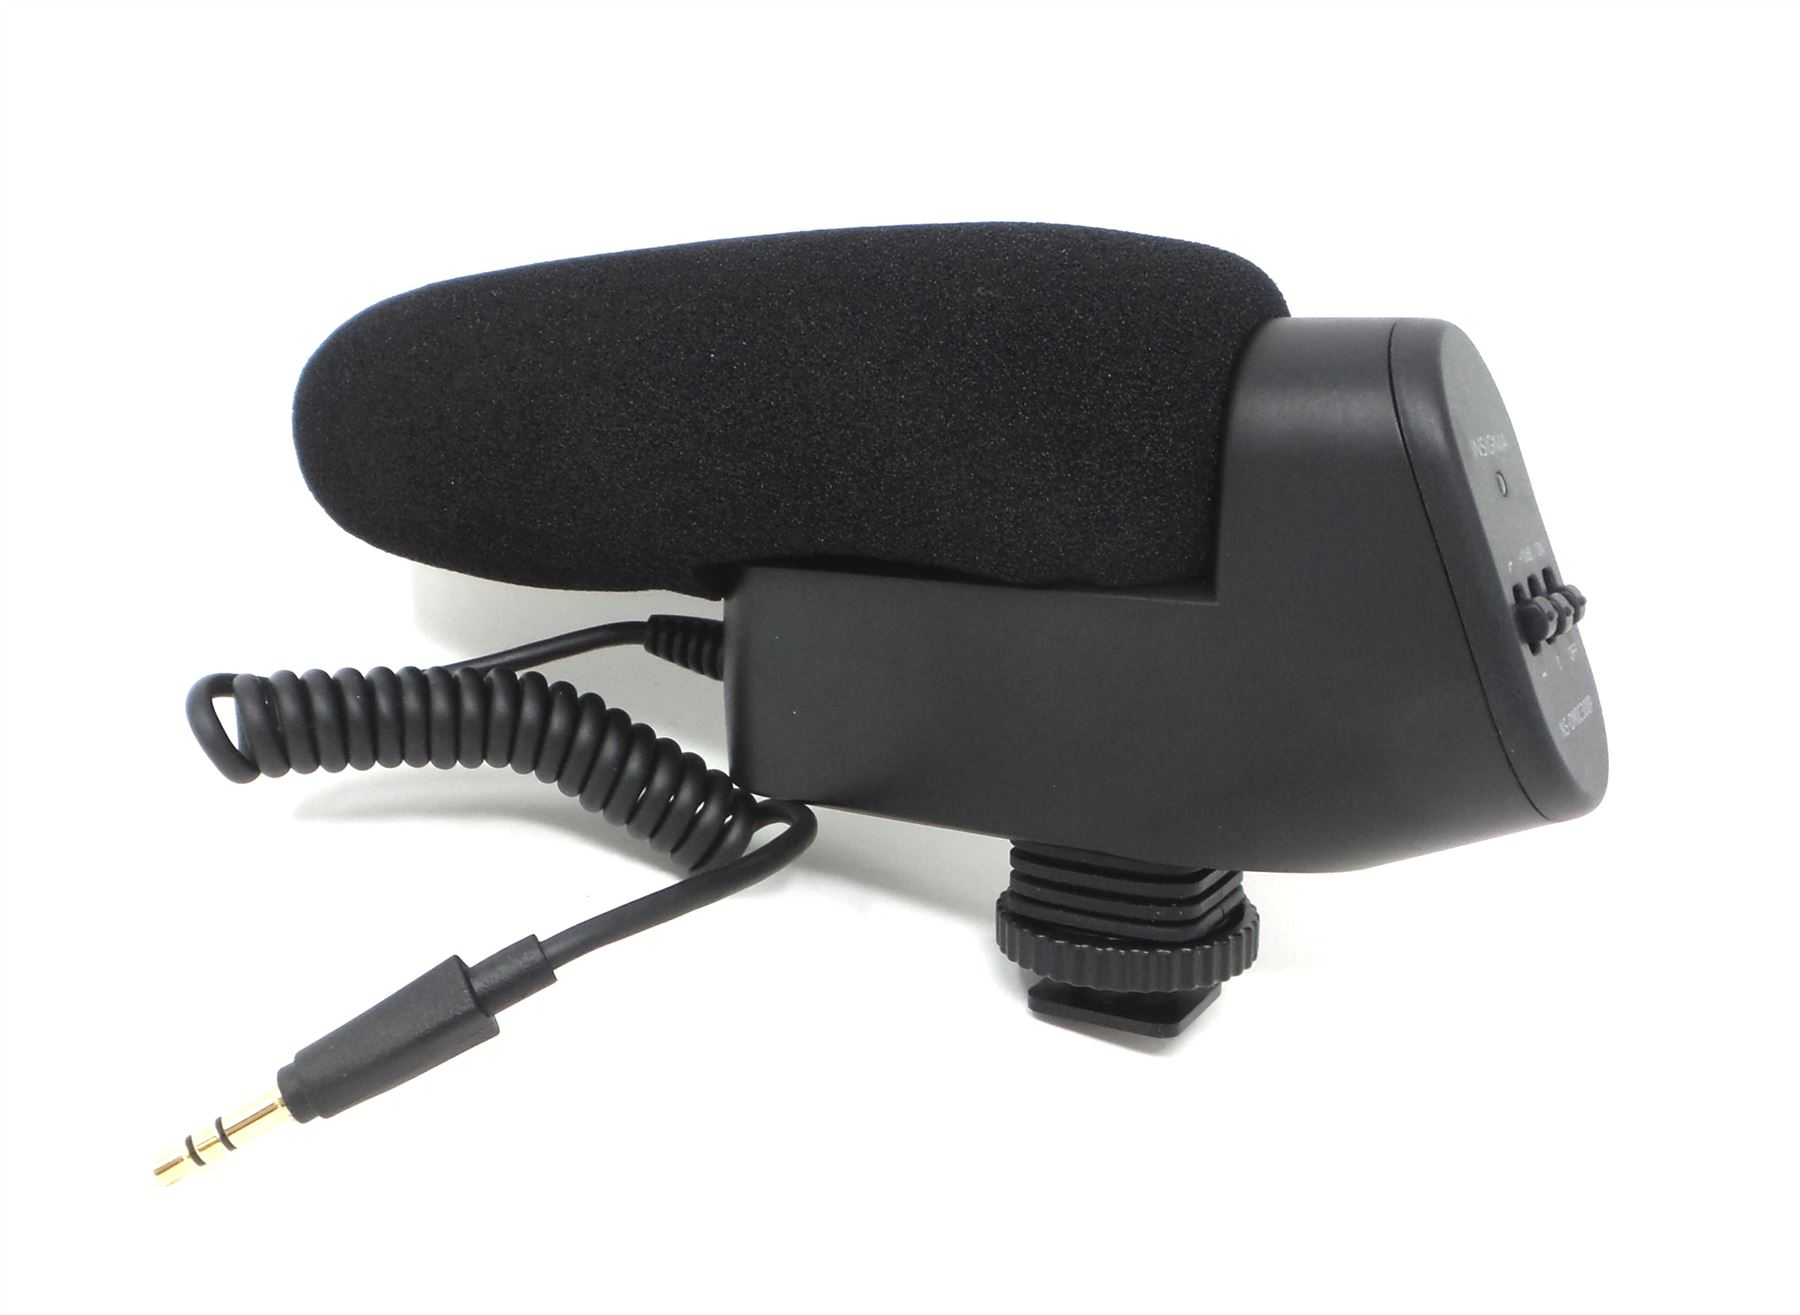 New Pyle PMKSF32 Video//Camera Condenser Shotgun Microphone w//3.5mm Connect GRAY